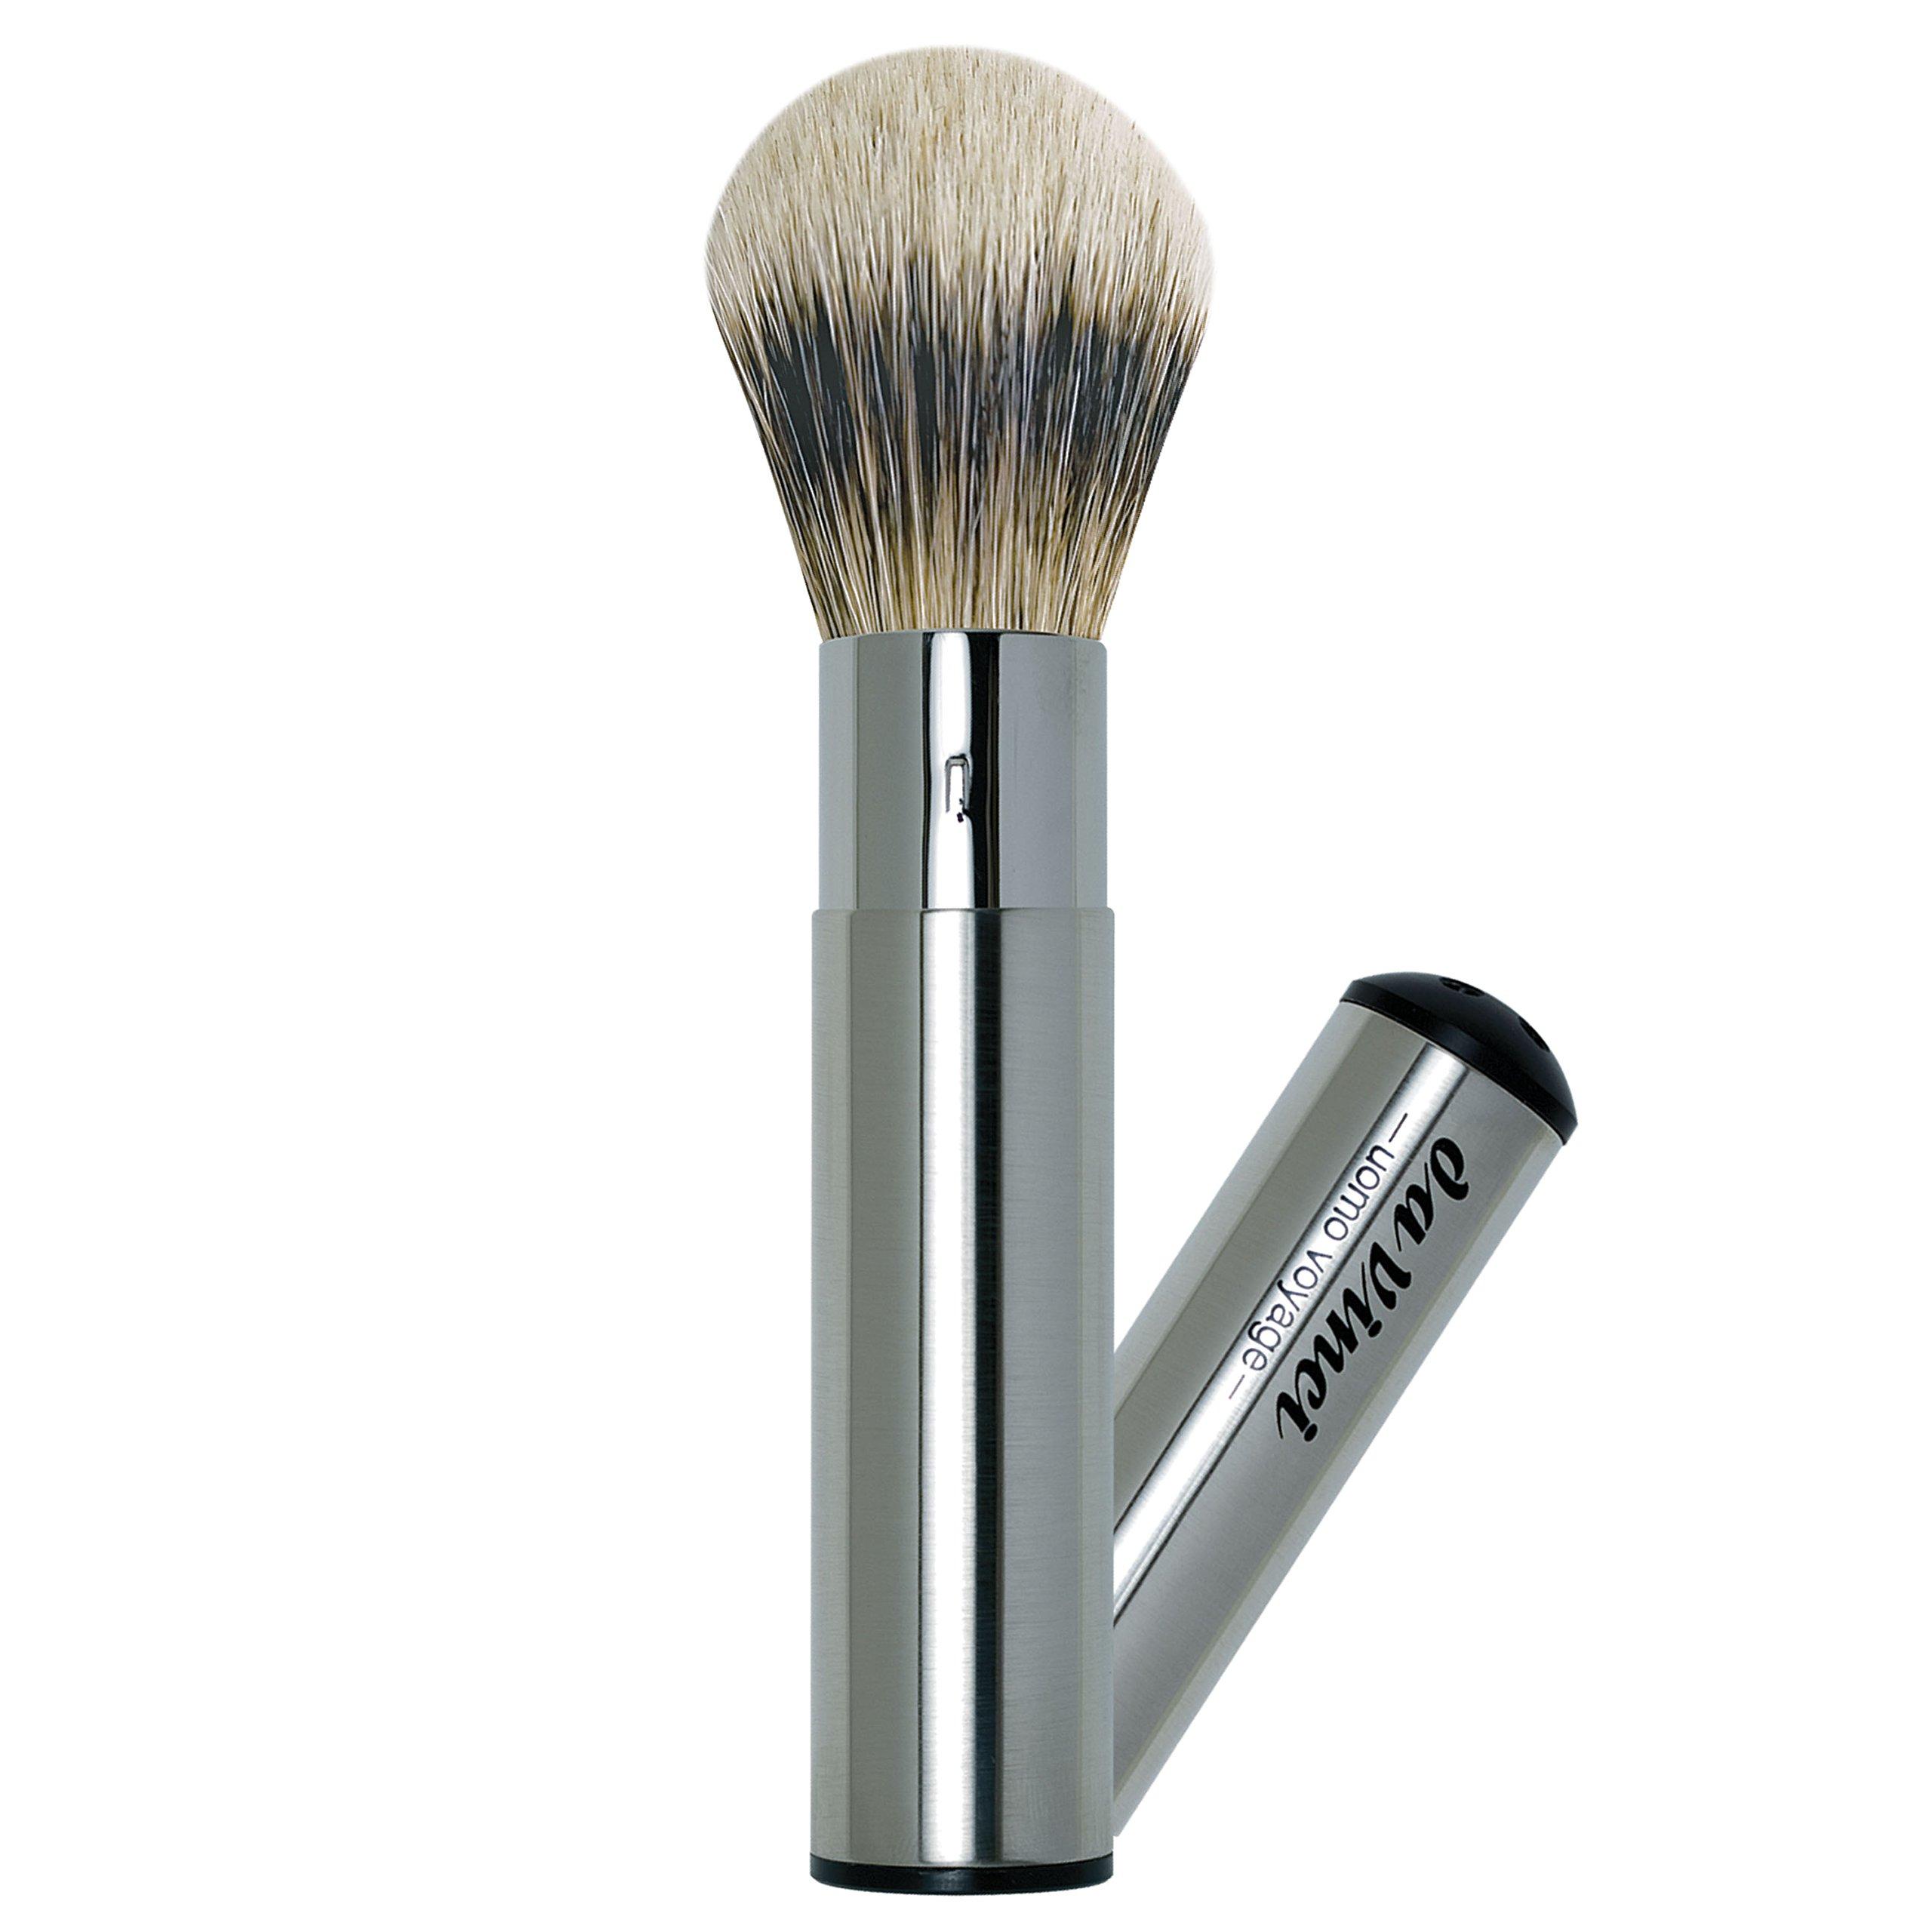 da Vinci Shaving Series 295 UOMO Silvertip Shaving Brush, Badger Hair with Retractable Metal Handle, 18mm, 83 Gram